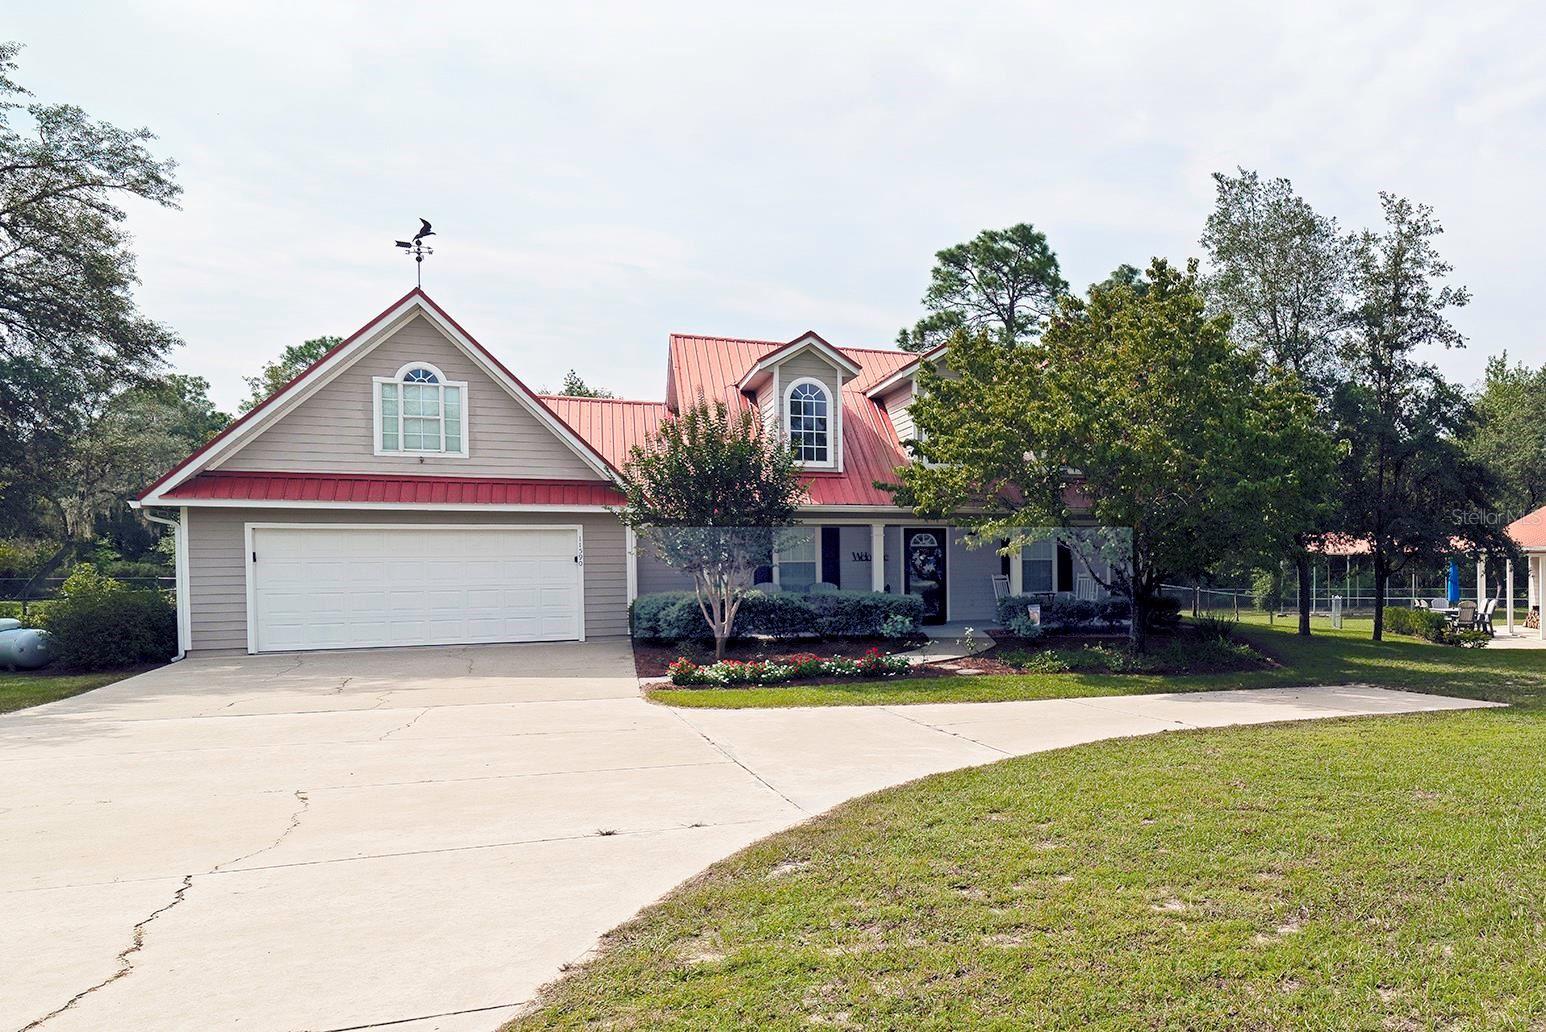 11590 NE 108TH STREET, Archer, FL 32618 - #: A4511913